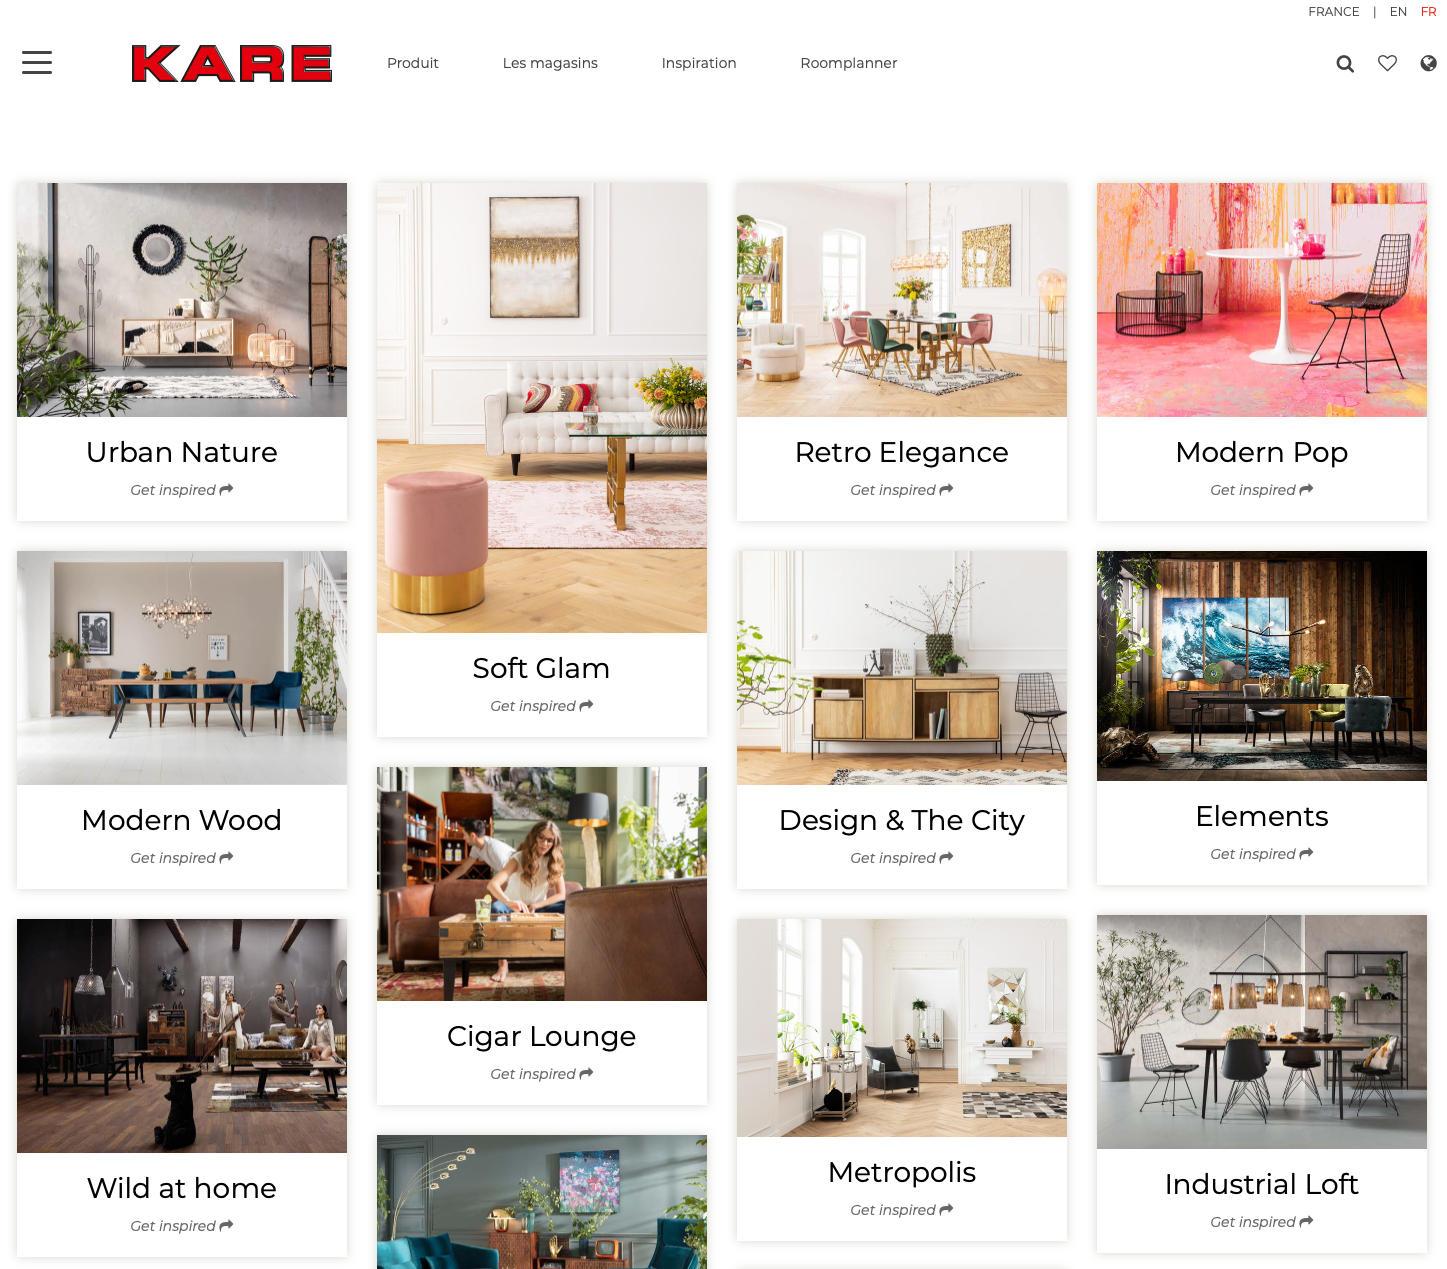 KARE-B2C Trendshows